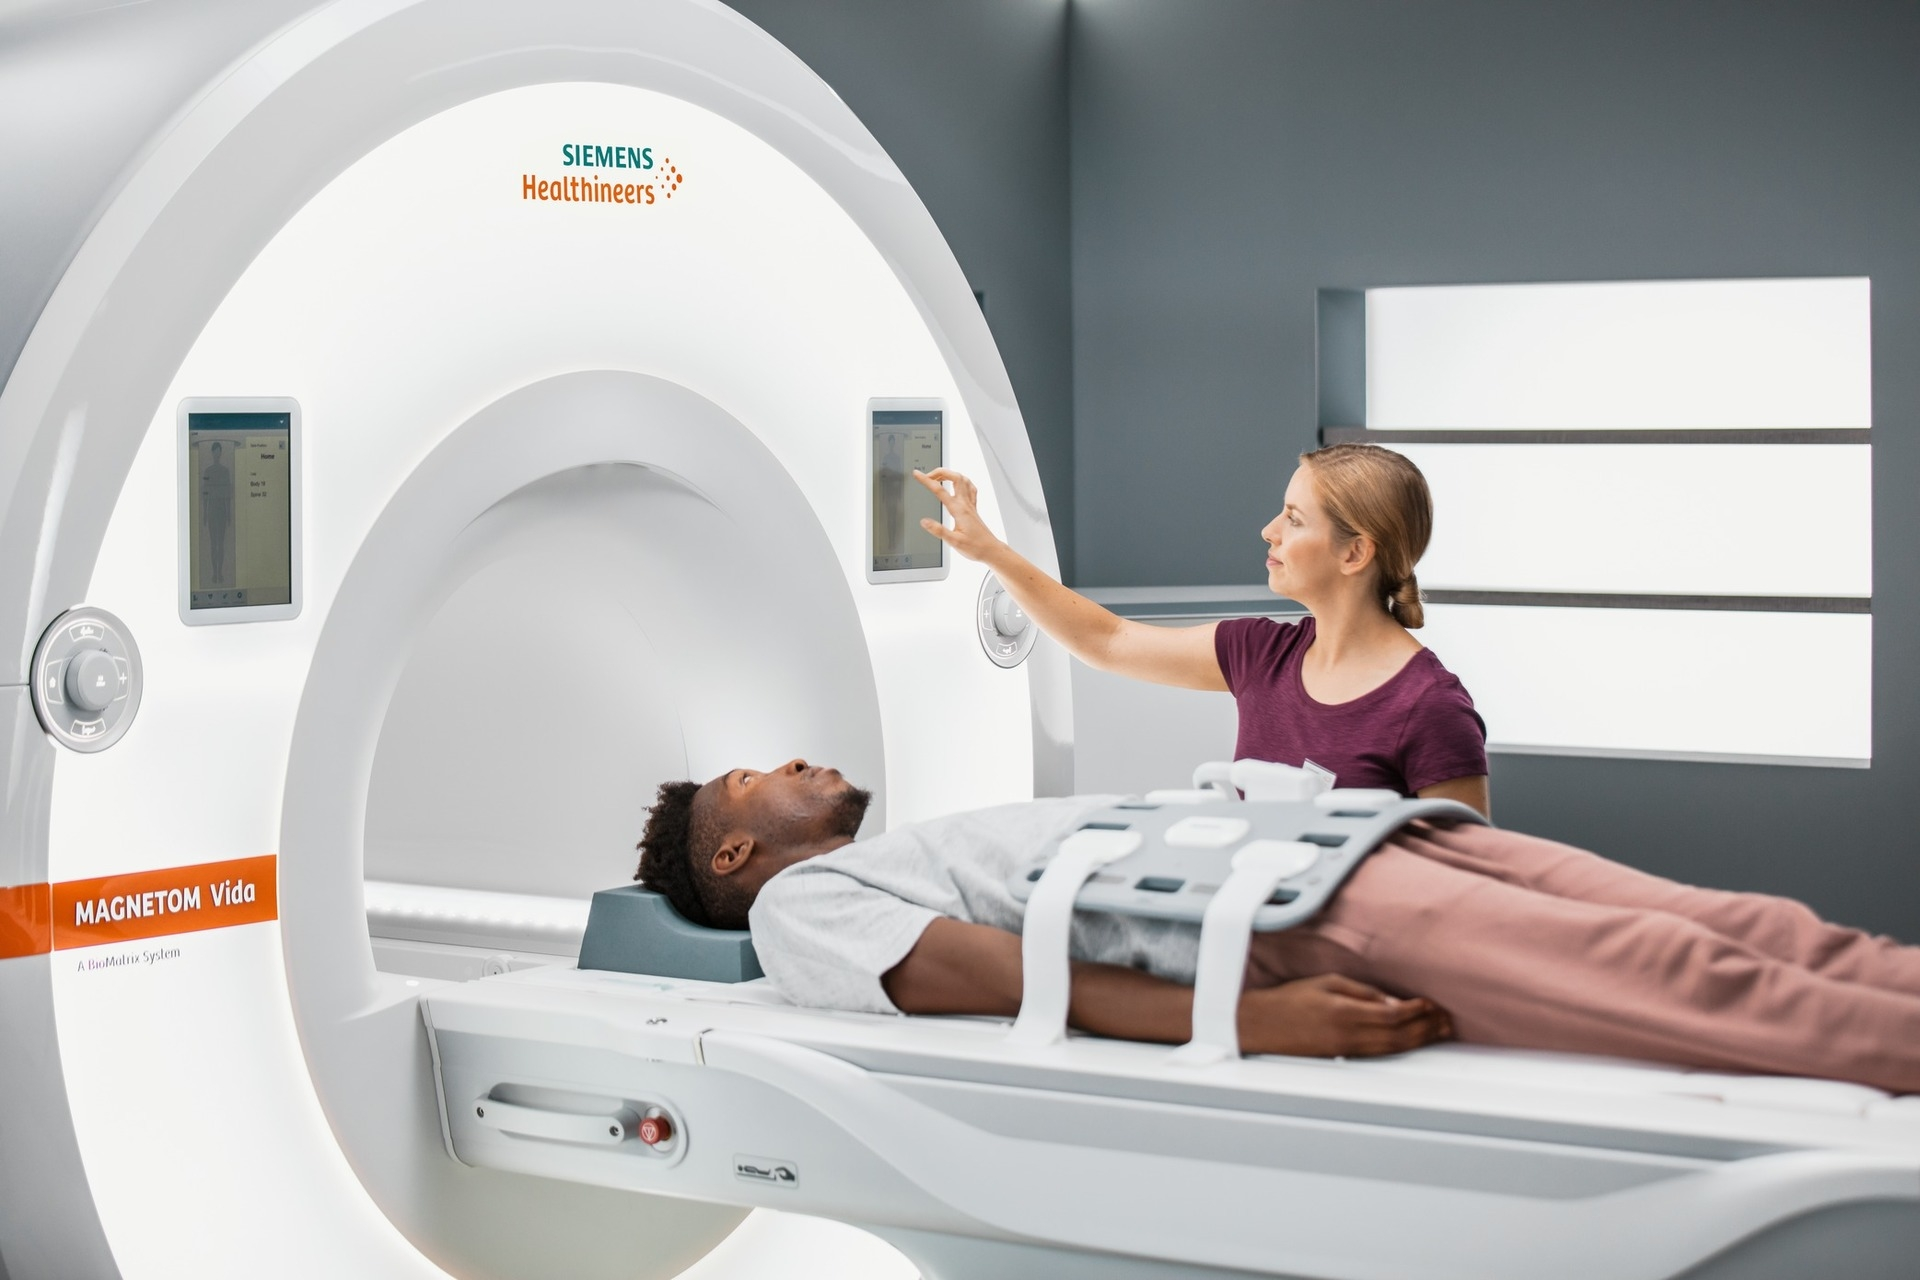 bringing siemens tech to healthcare